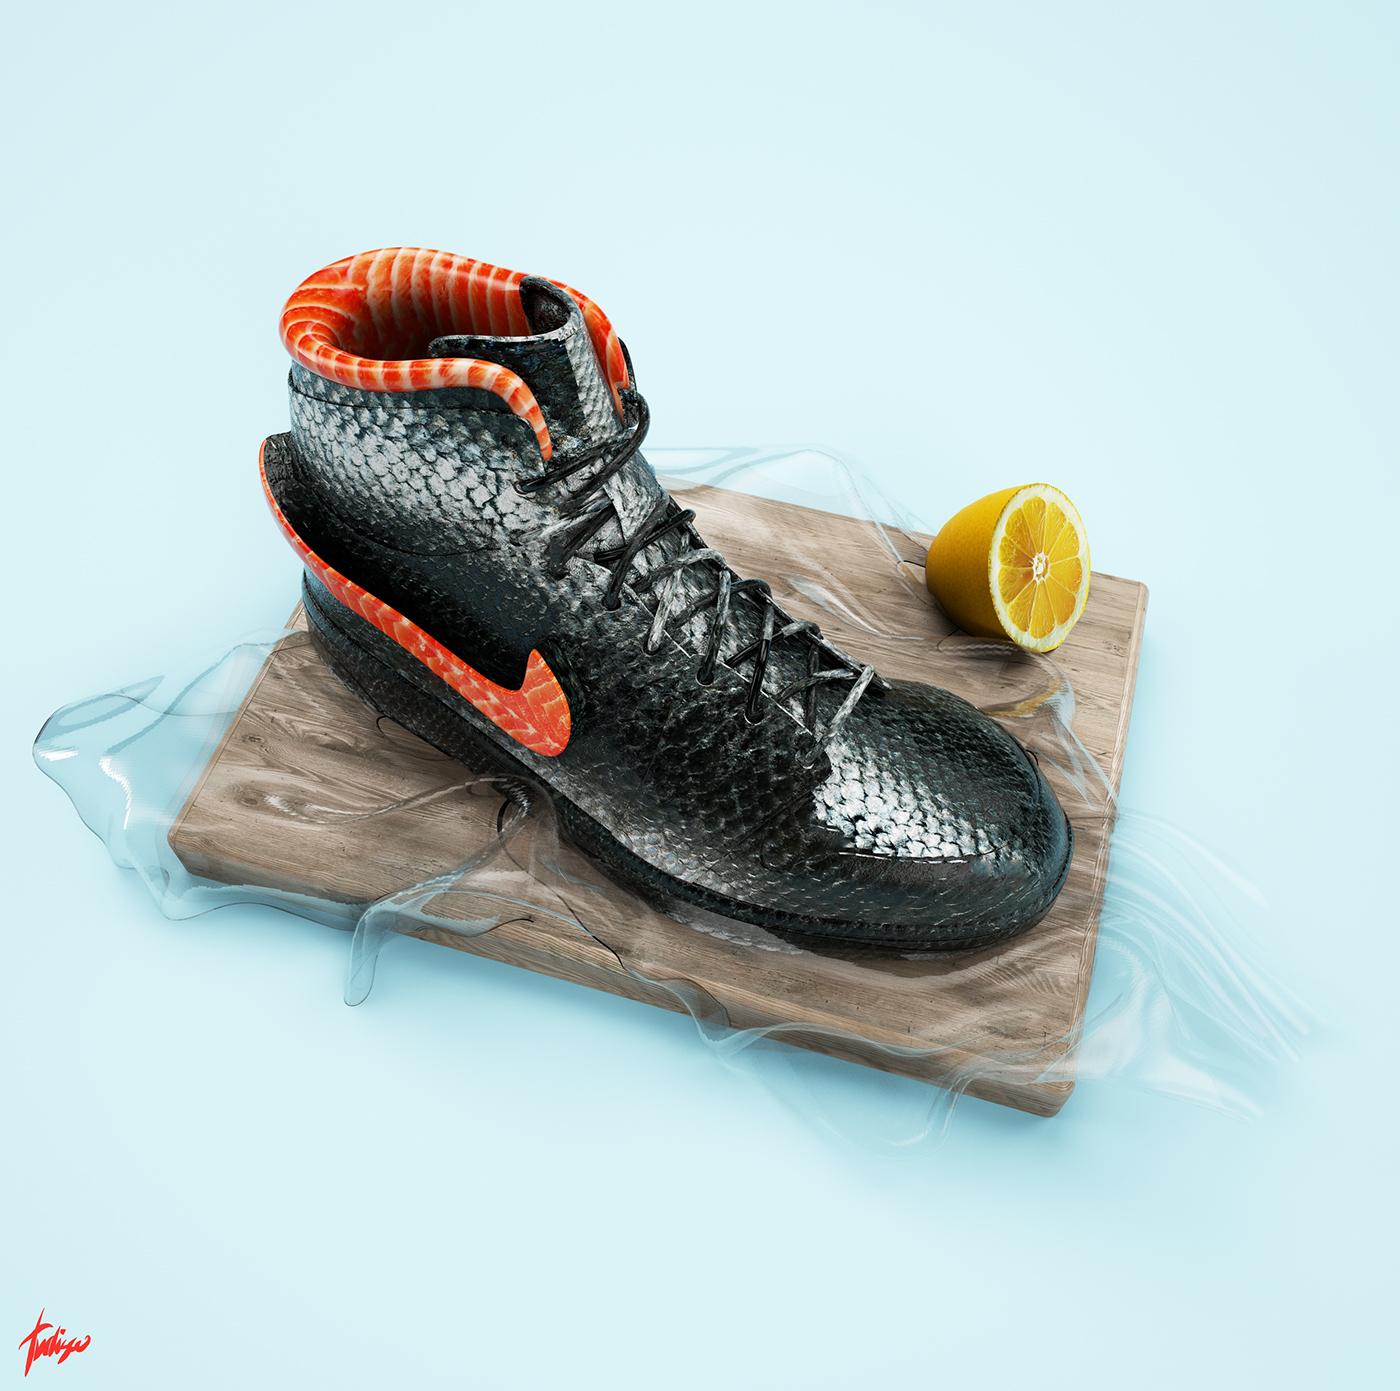 fb9f48a997a4f3 the best 6ae70 7d6da nike road cycling shoes on behance - lewendy.com